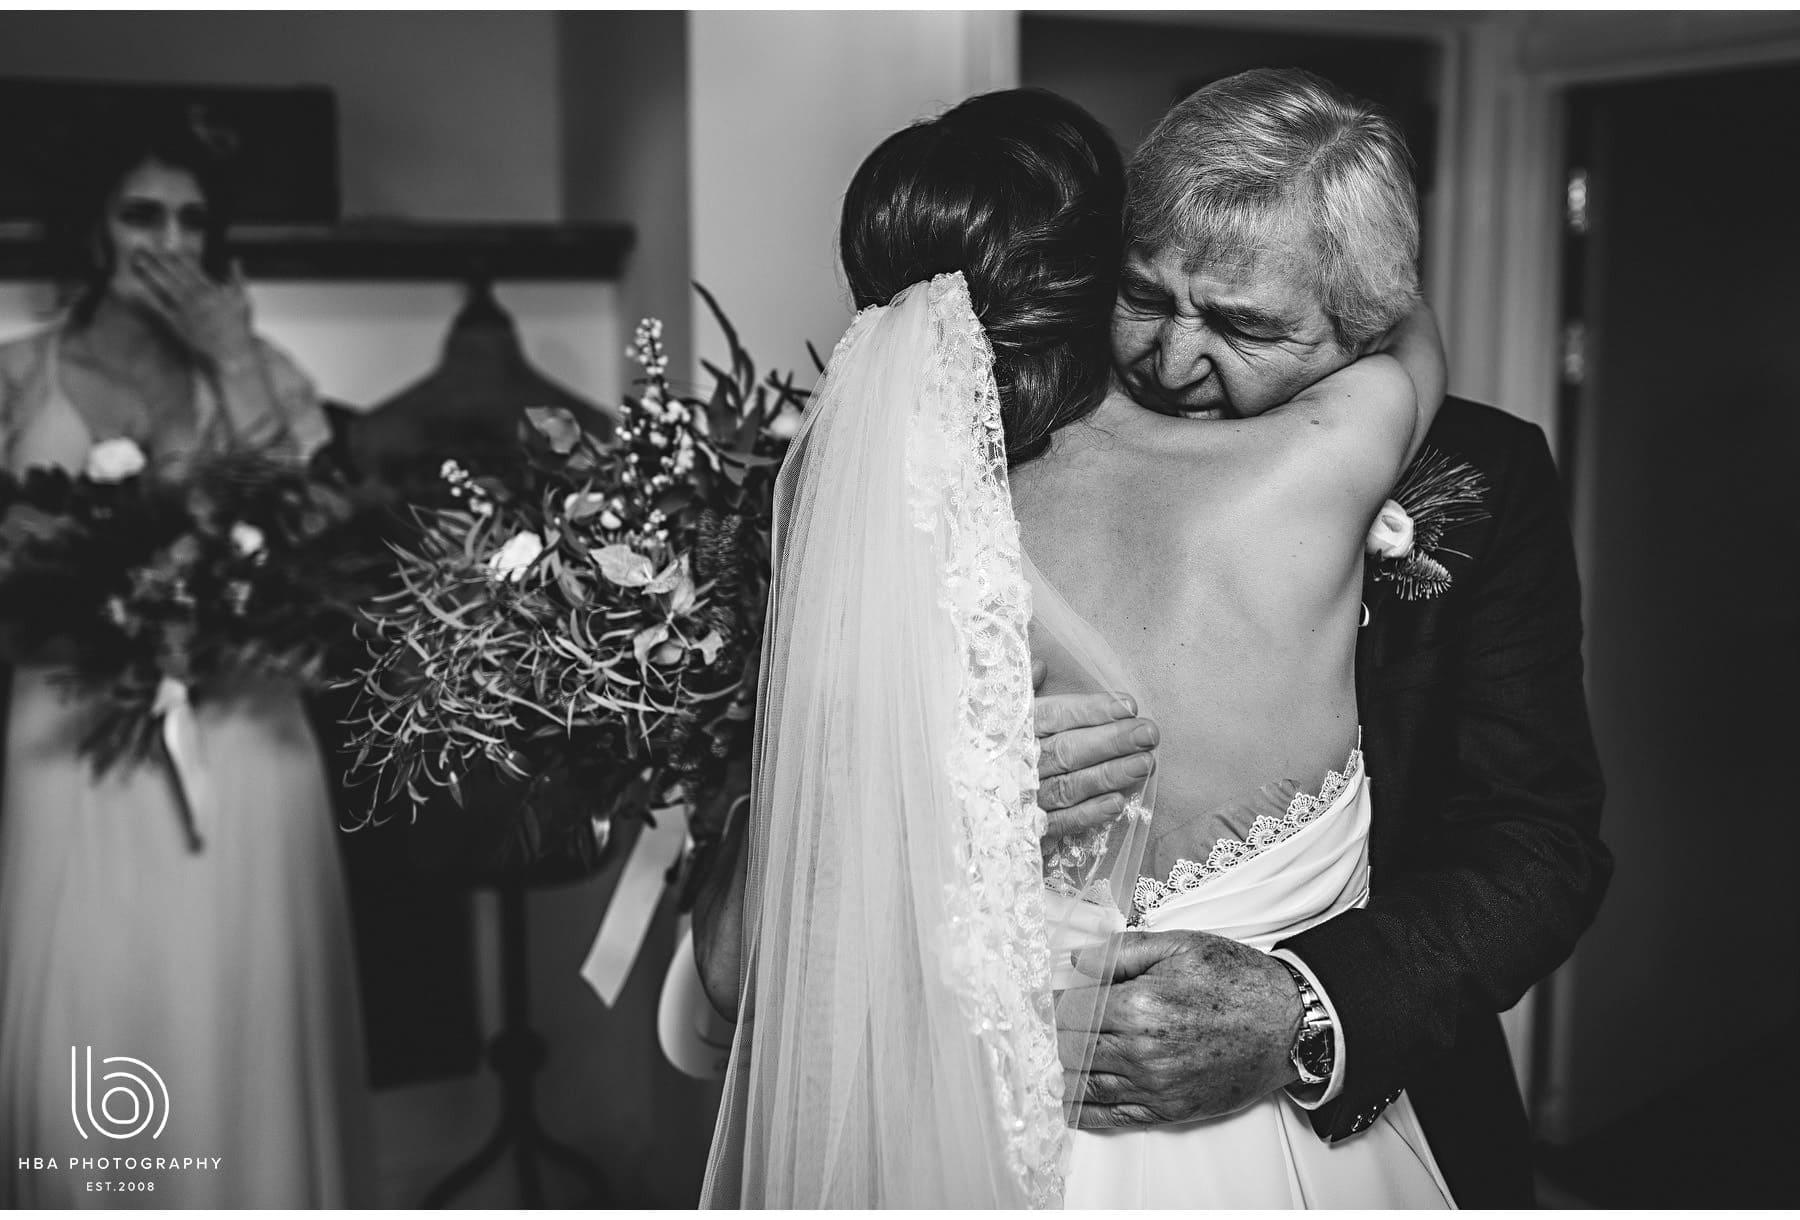 the bride hugging her dad